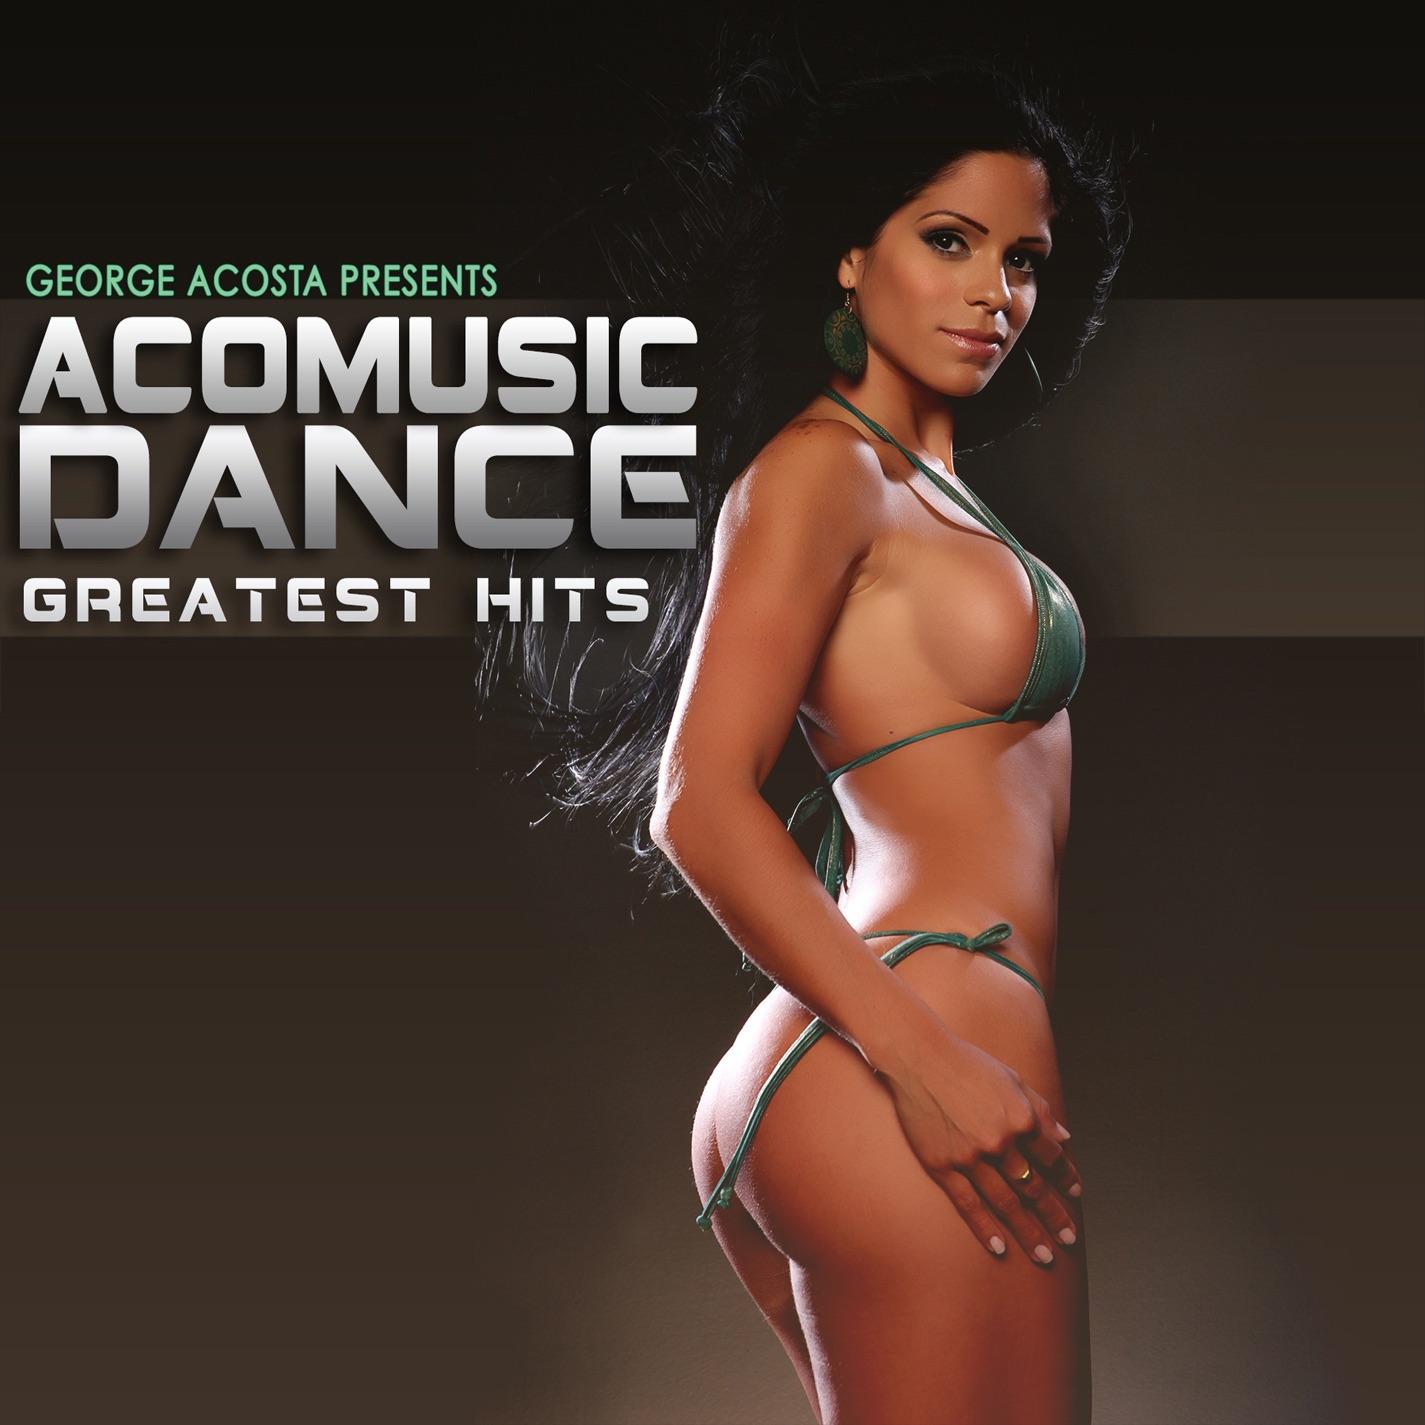 George Acosta Presents: Aco Music Greatest Hits